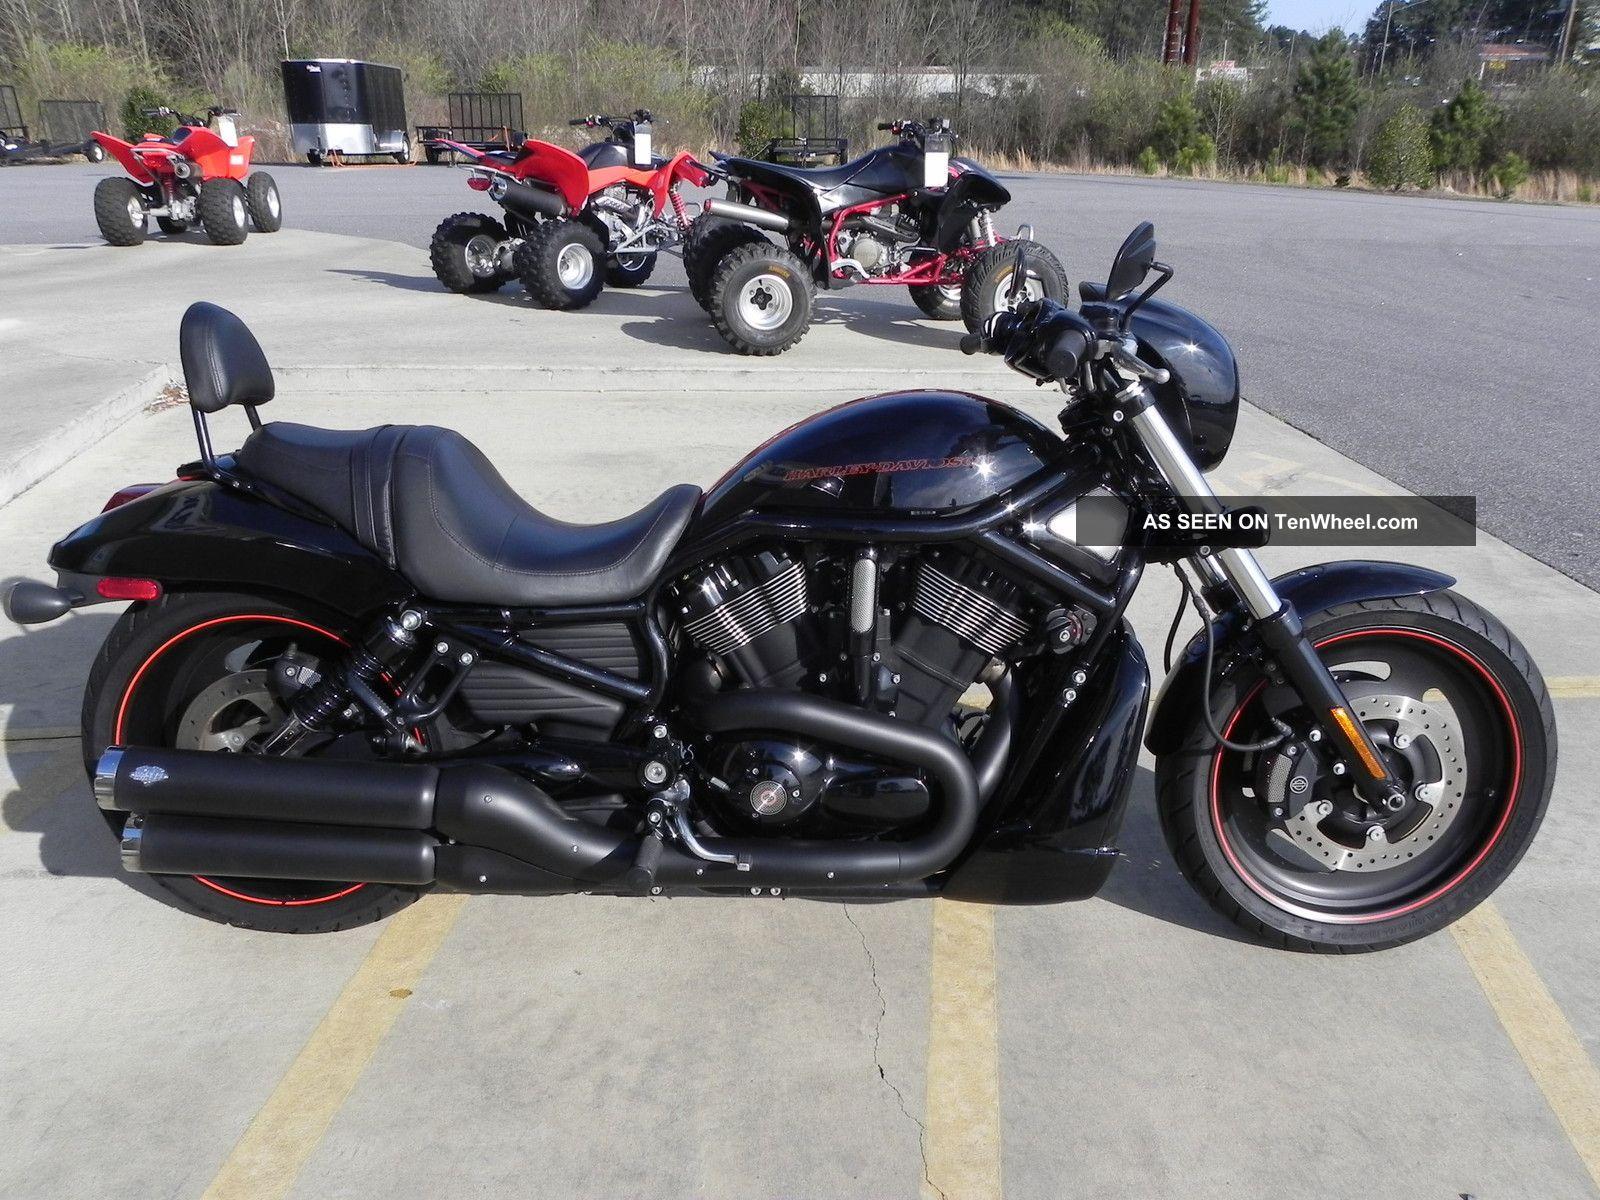 2008 Harley Davidson Vrscdx Vrod V Rod Night Special Has Exhaust